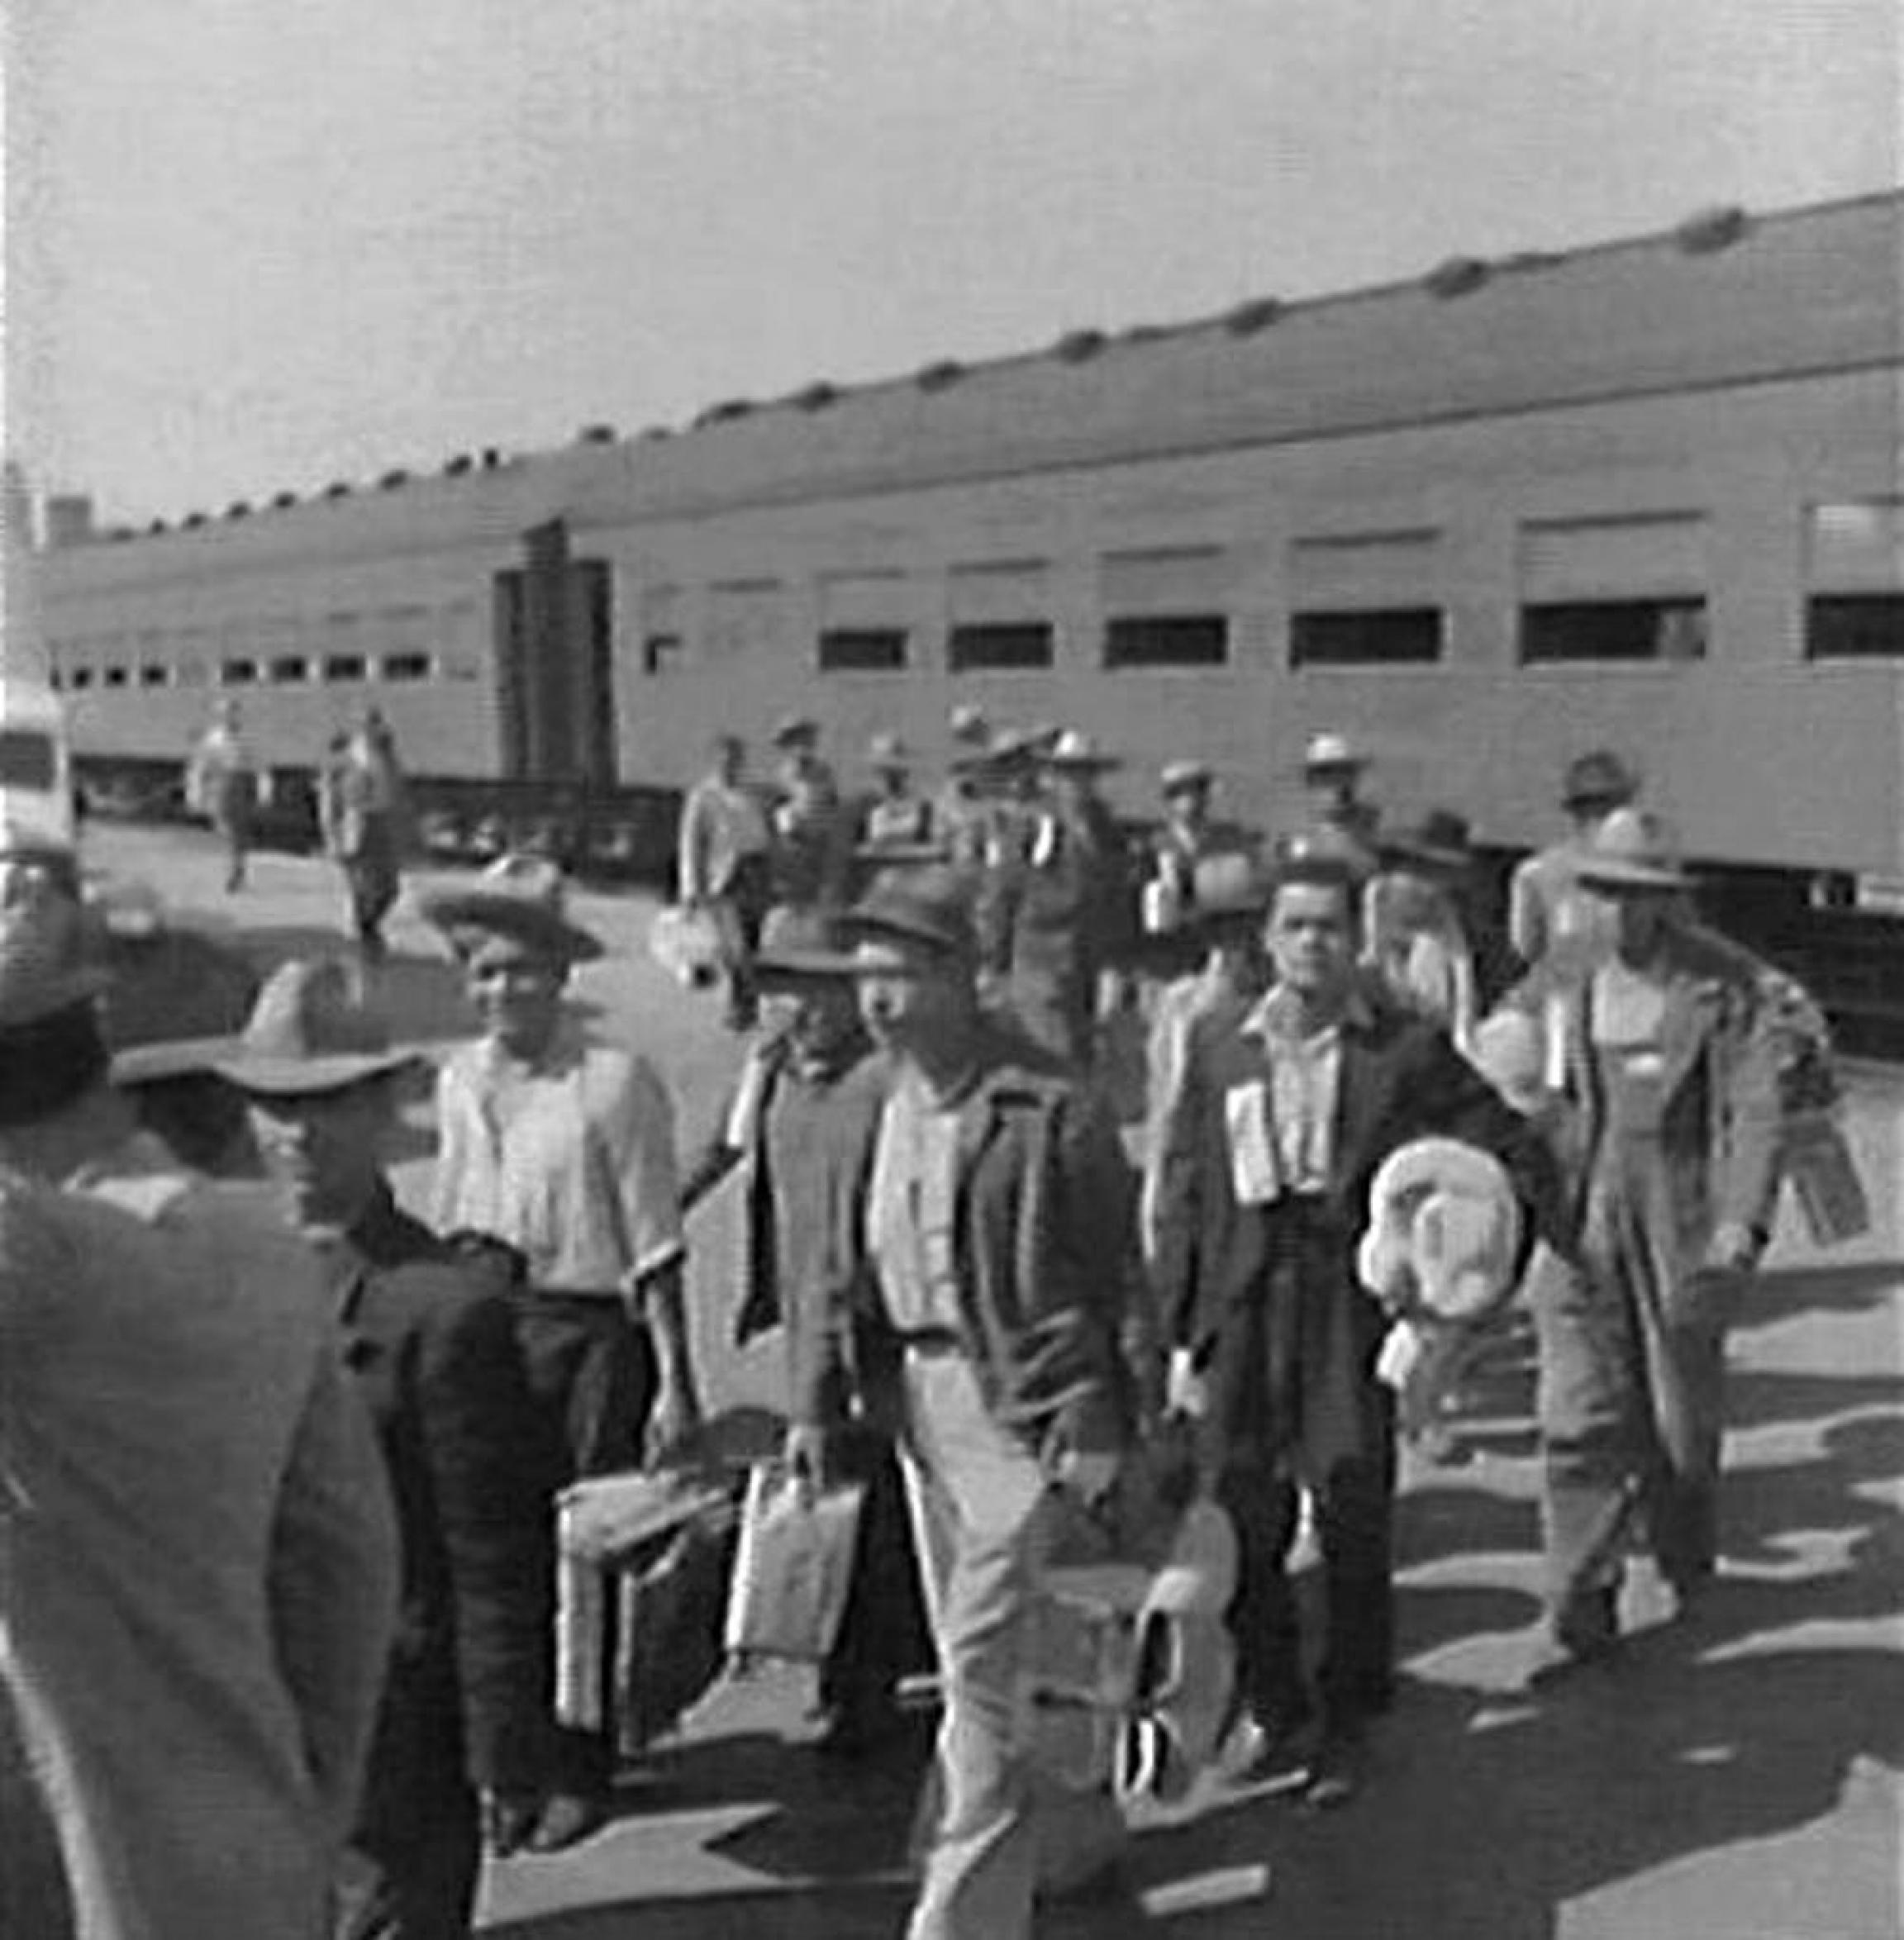 Mexican migrants during the Bracero program.